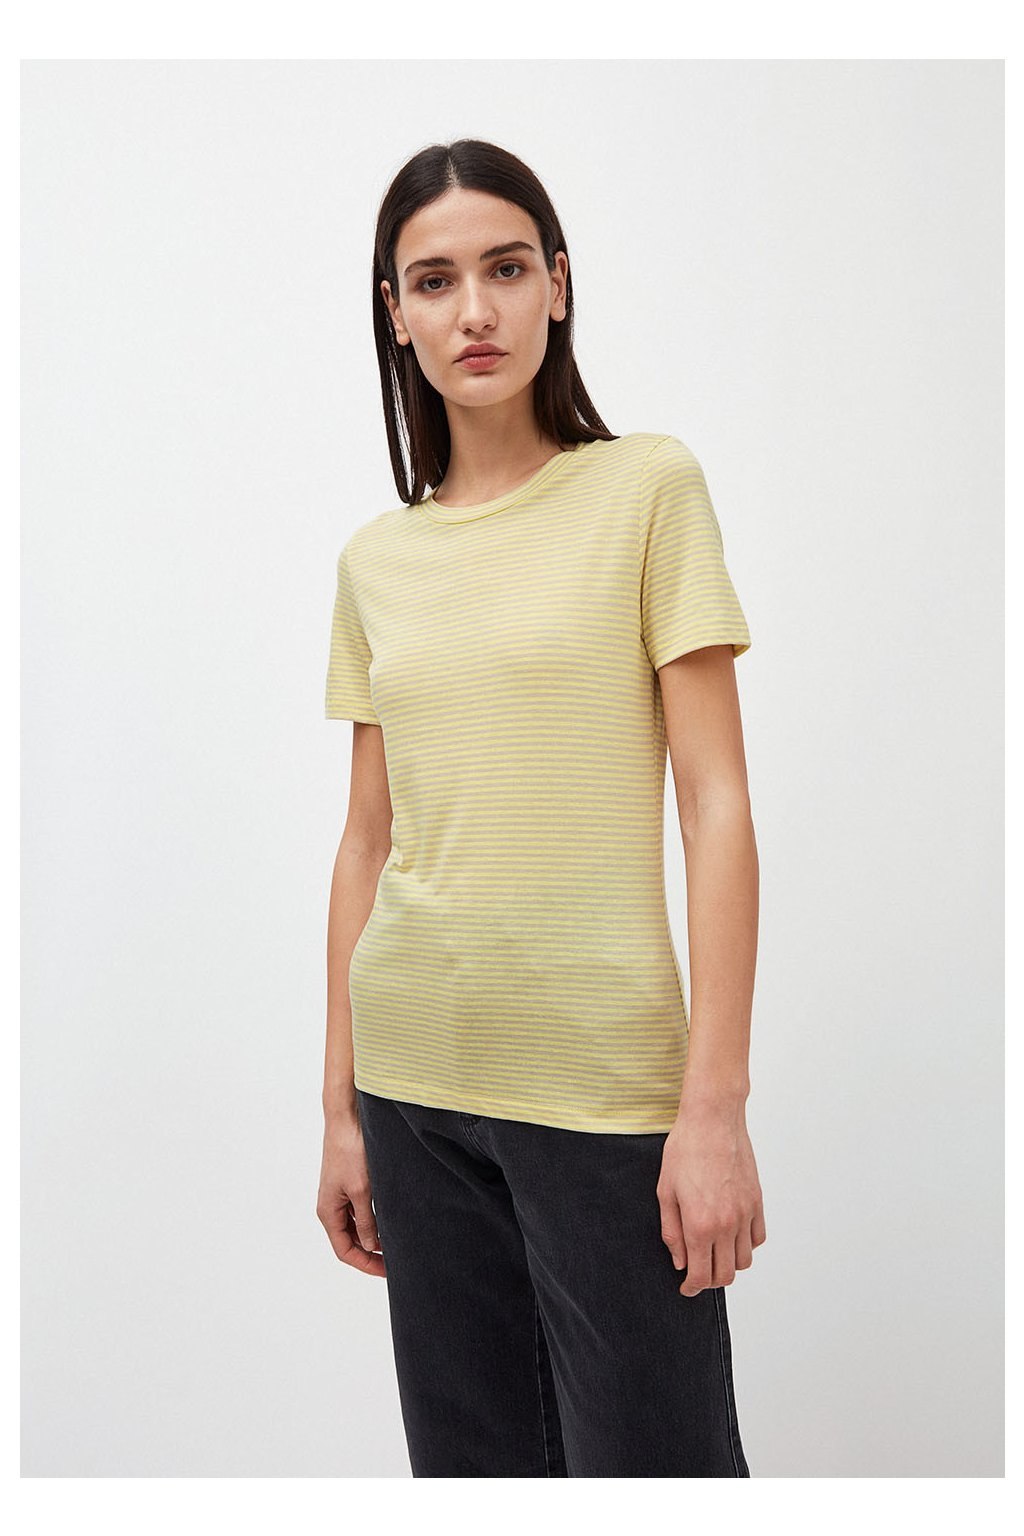 "Dámské pruhované tričko z biobavlny ""Lidaa Ring Stripes Lime/Kitt"" (Velikost L)"